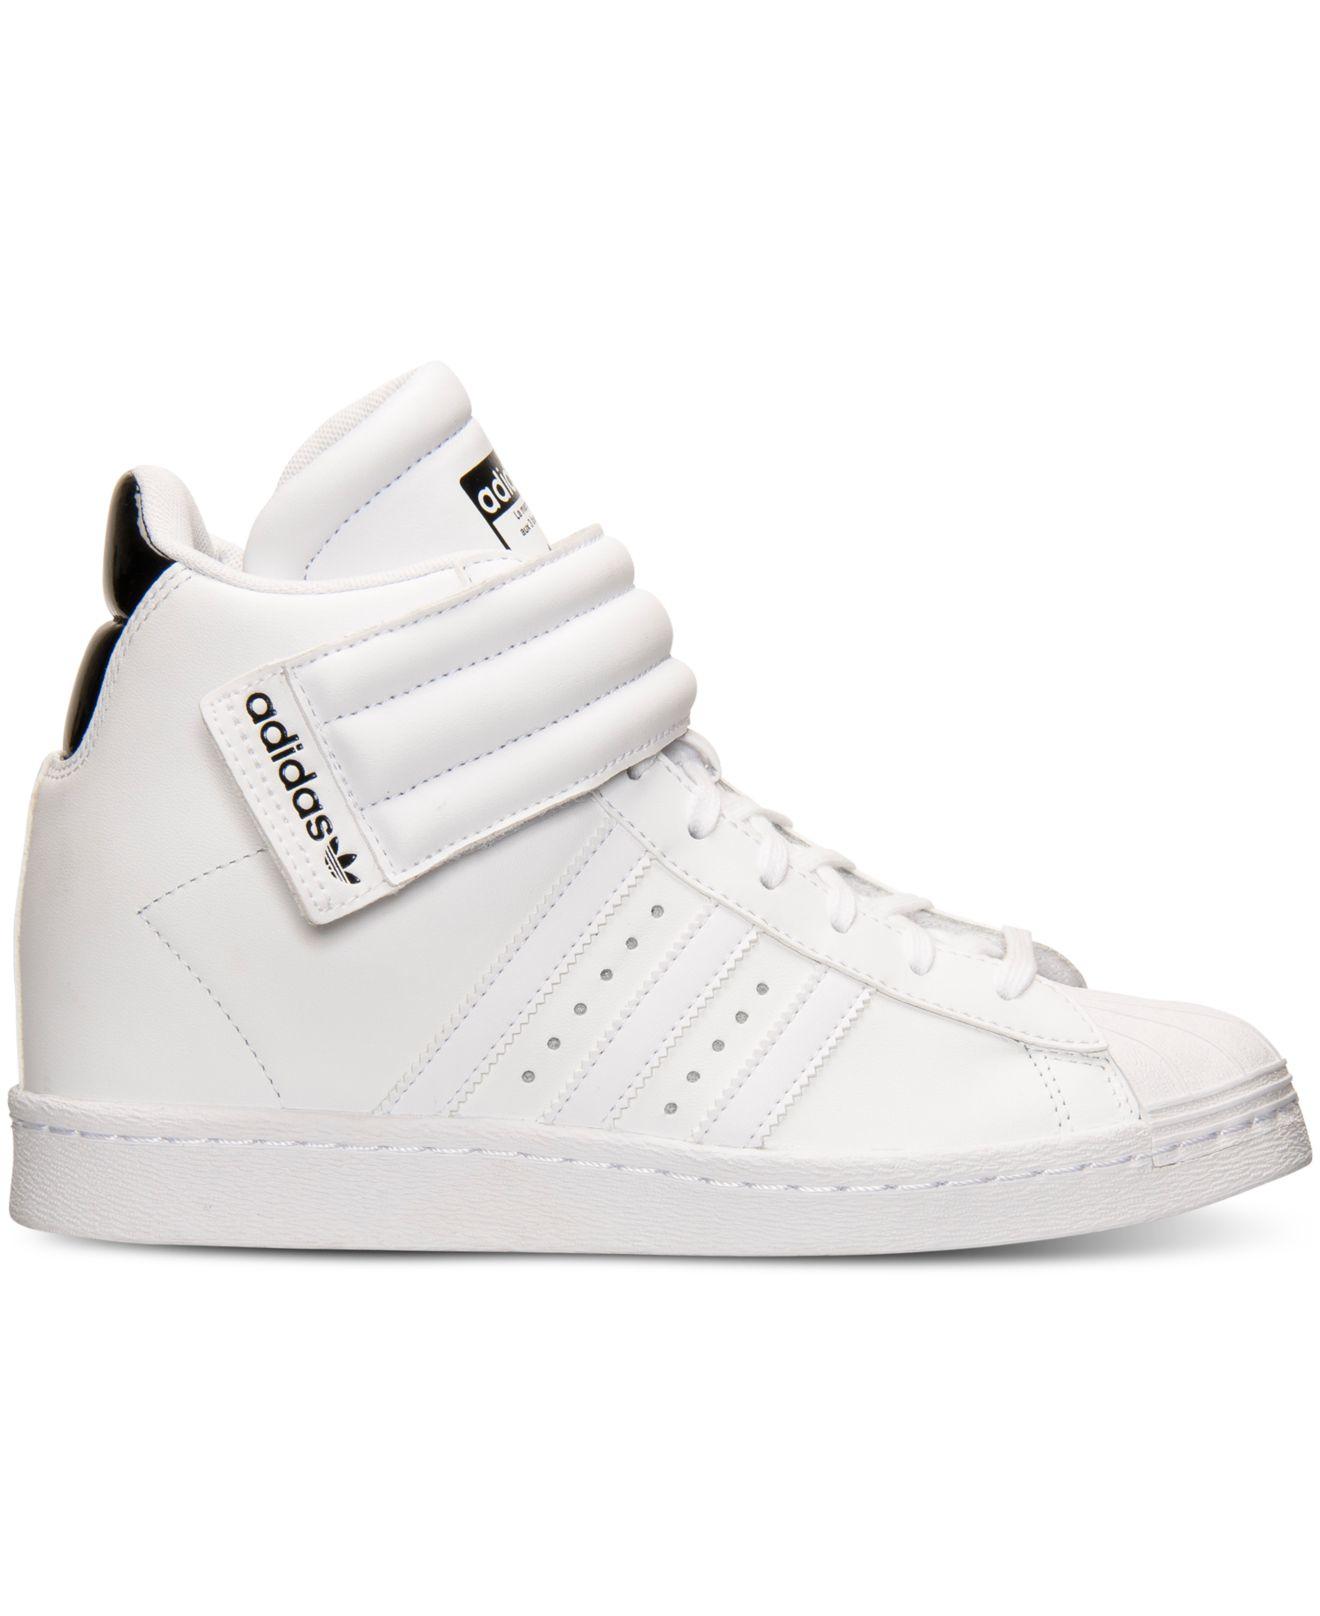 c13862795 Lyst - adidas Originals Women s Superstar Up Strap Casual Sneakers ...